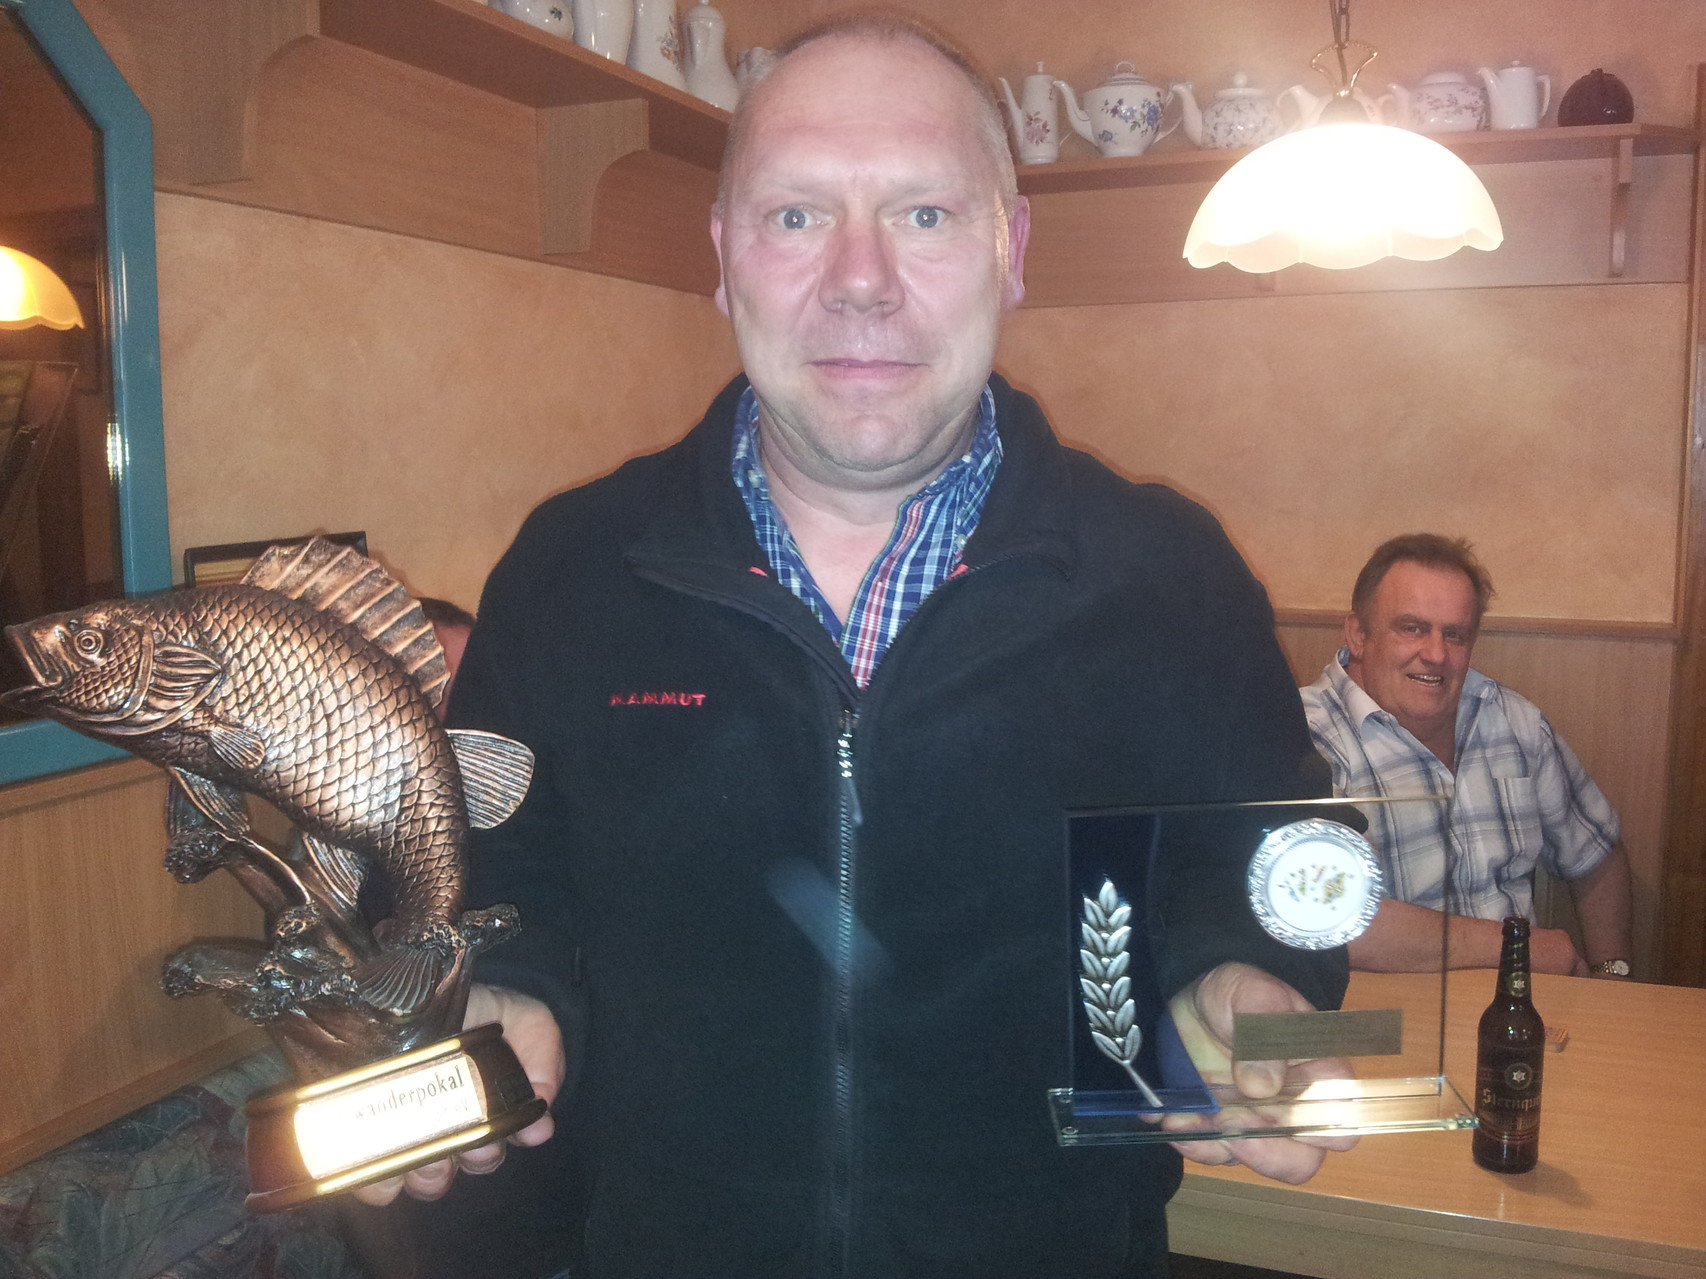 1. Platz - Maik Lindner - 2702 Punkte